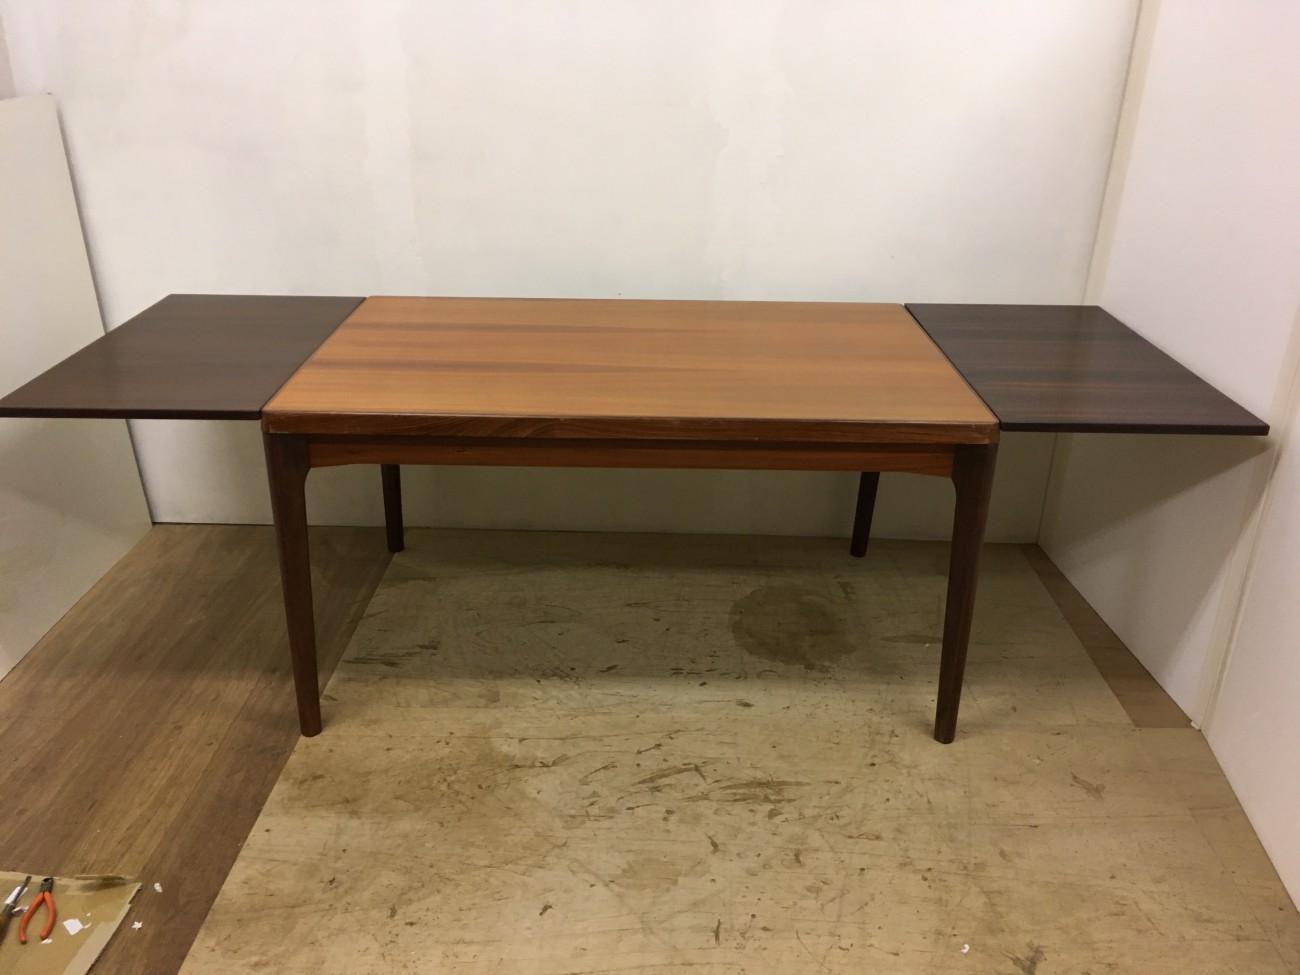 VEJLE STOLE-og MOBELFABRIK エクステンション ダイニングテーブル ローズウッド(Rosewood)